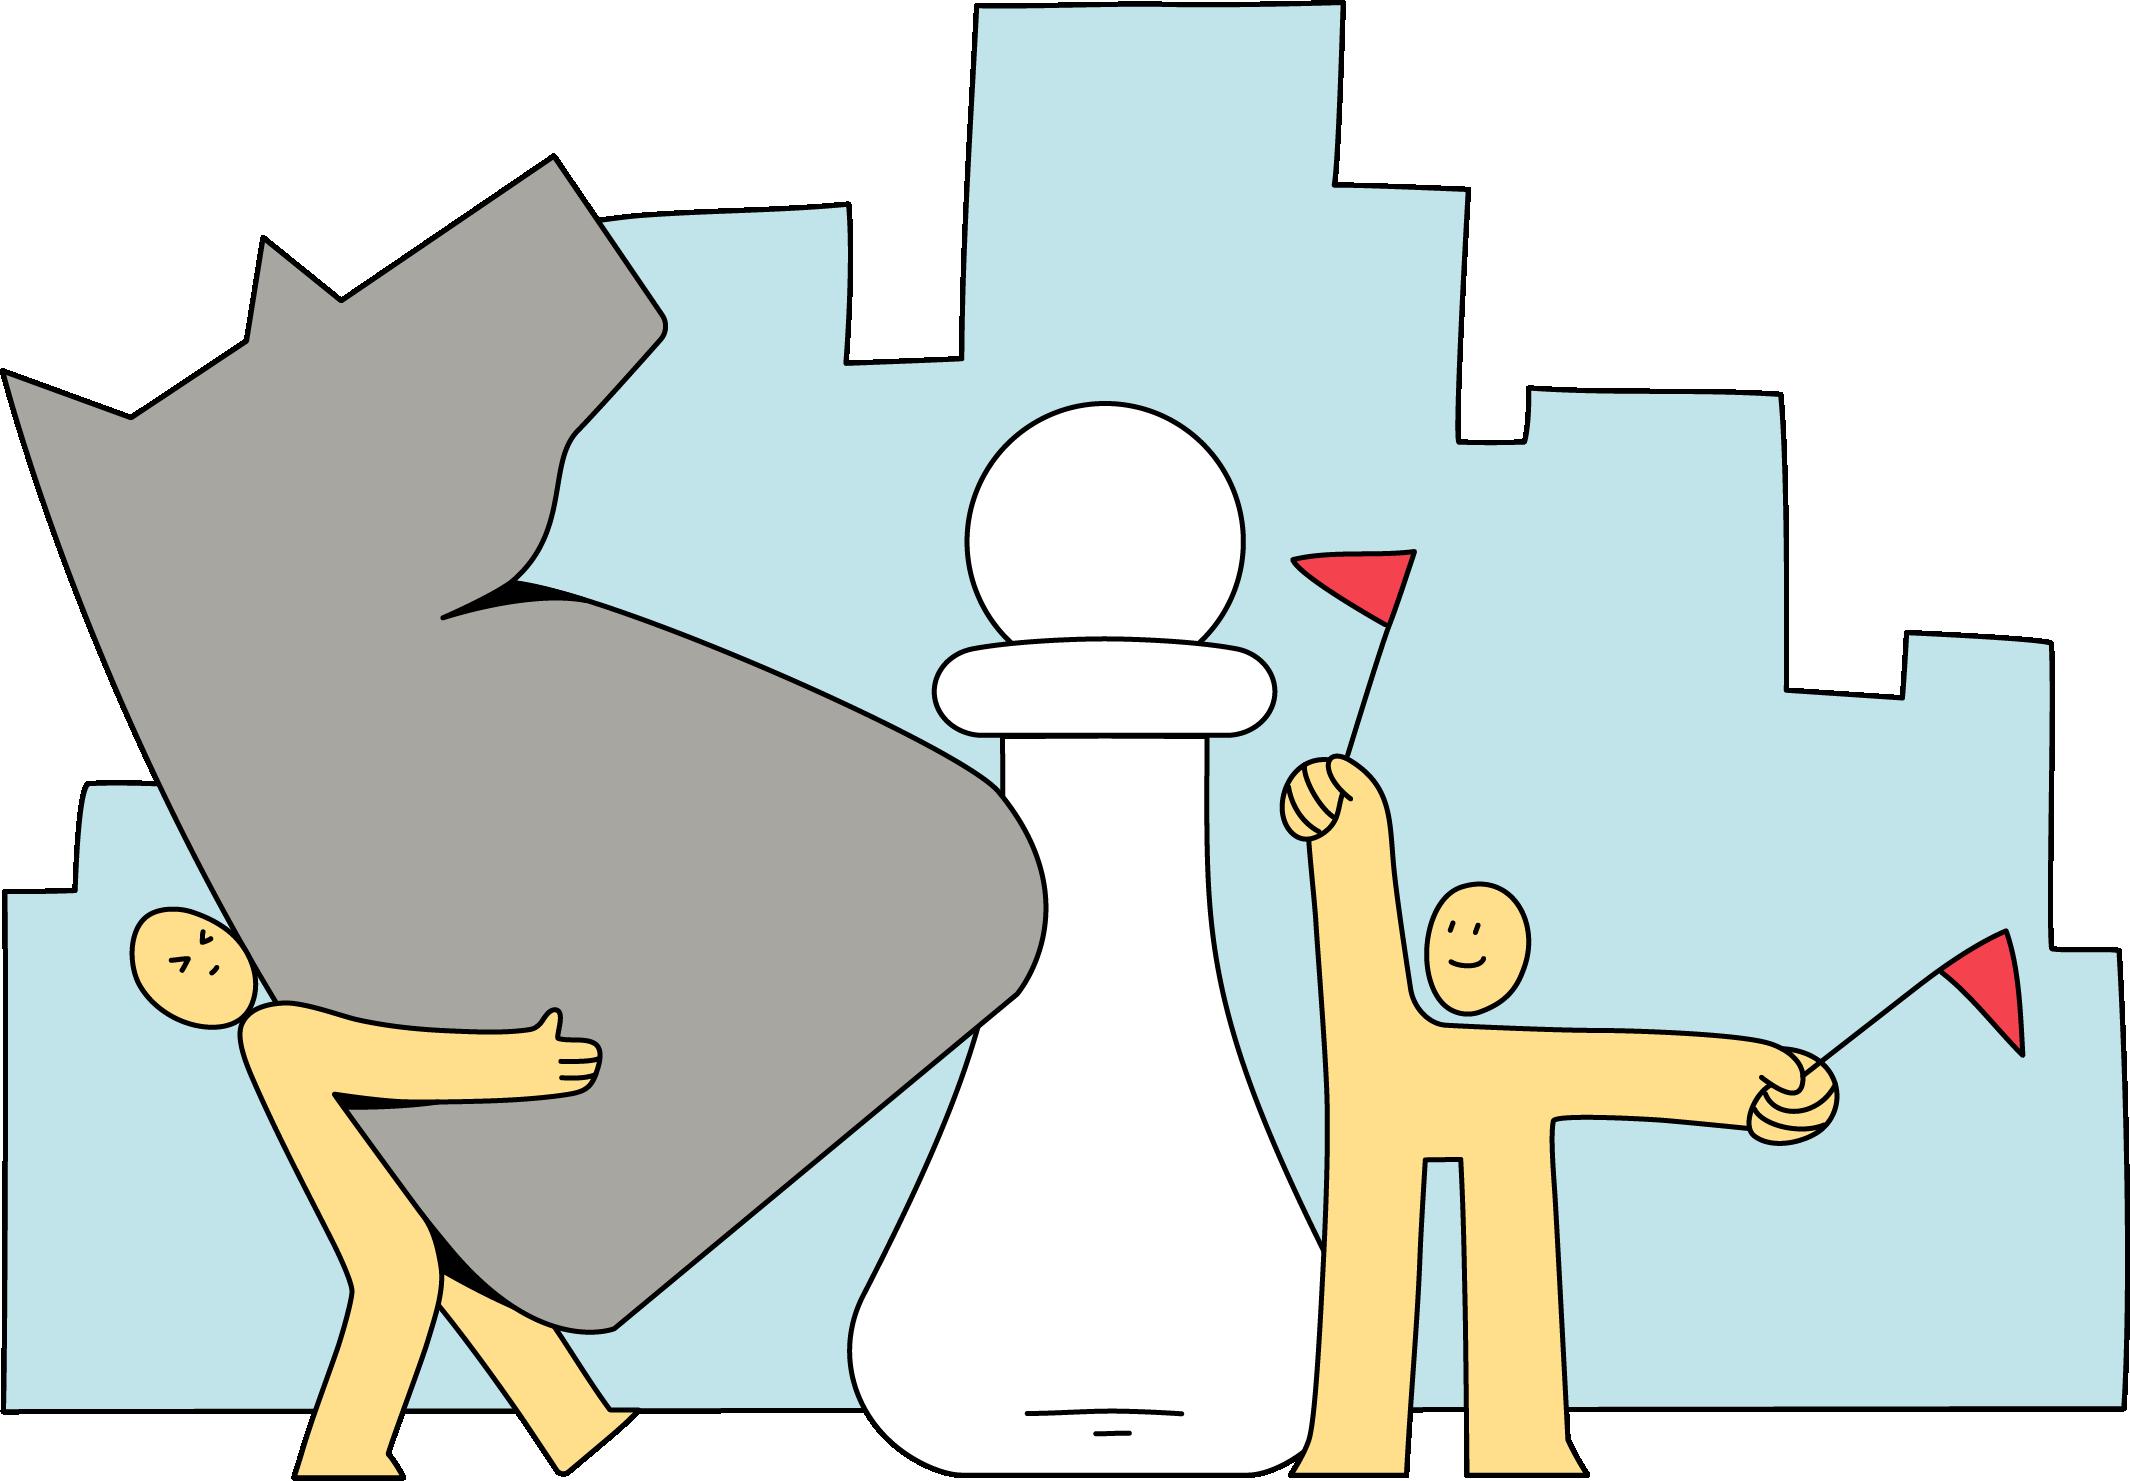 Ilustracion de dos personajes jugando al ajedrez